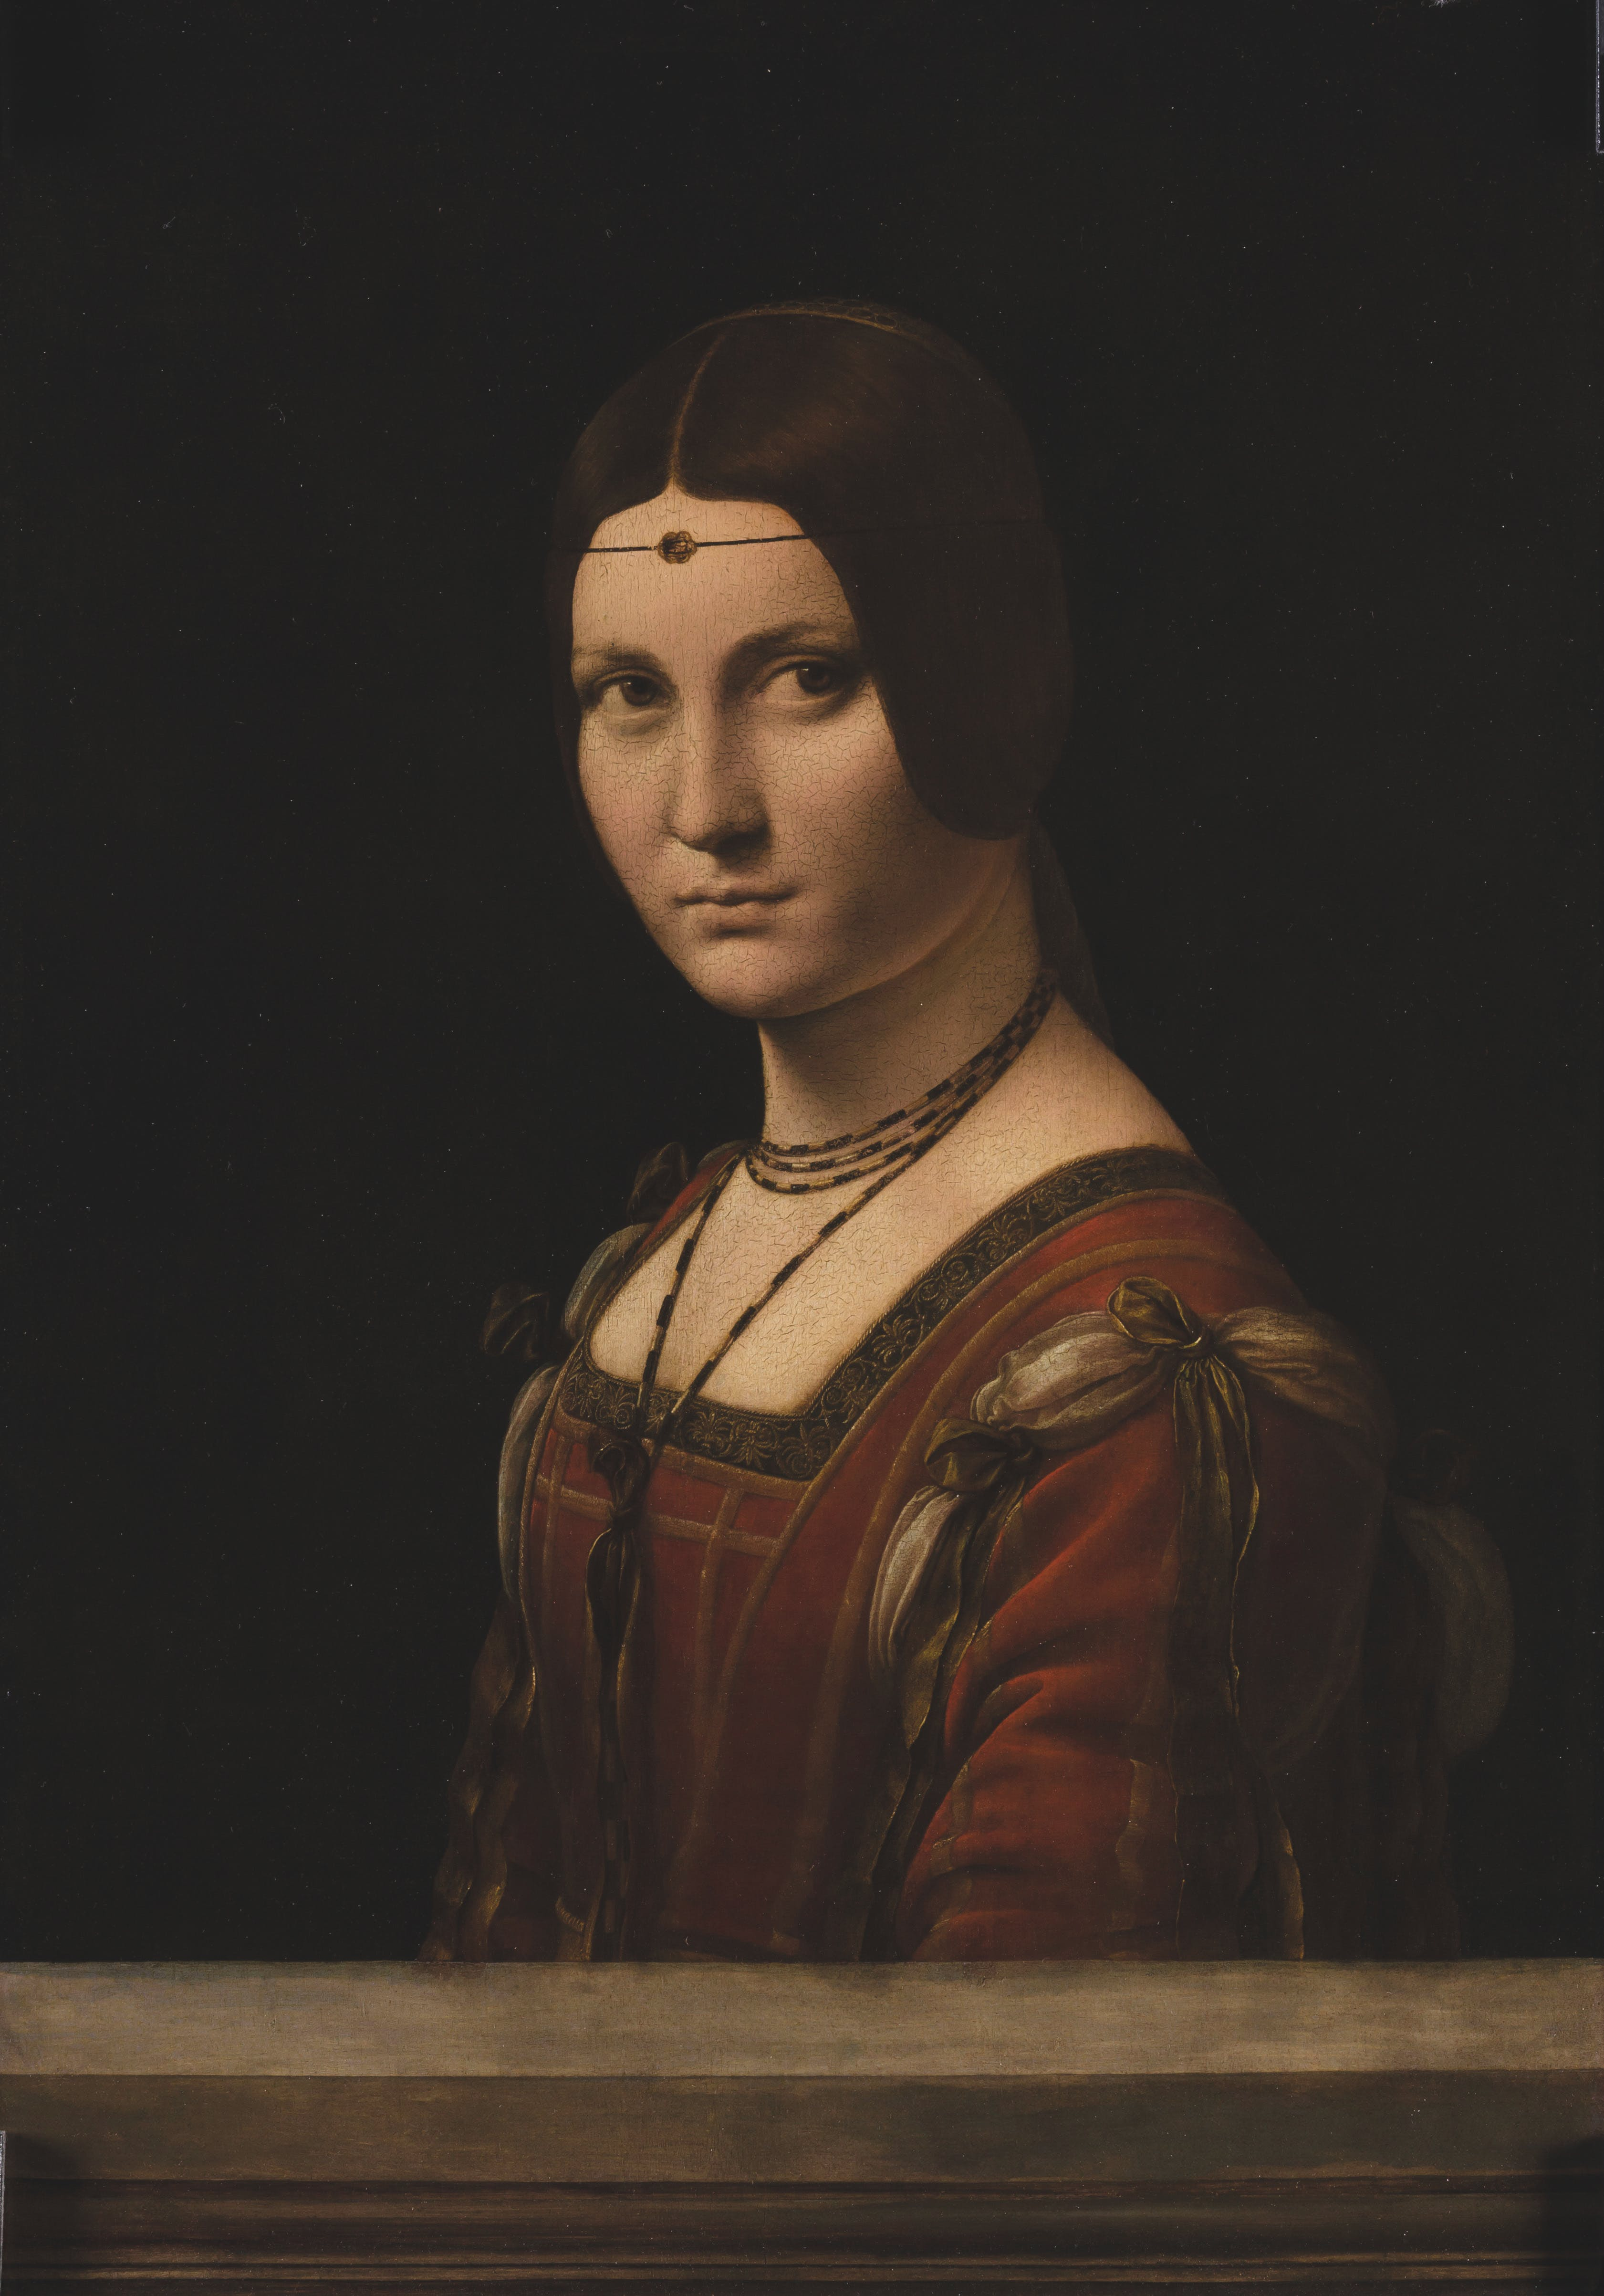 La Belle Ferronnière, (1495–99), Leonardo da Vinci, Musée du Louvre, Paris